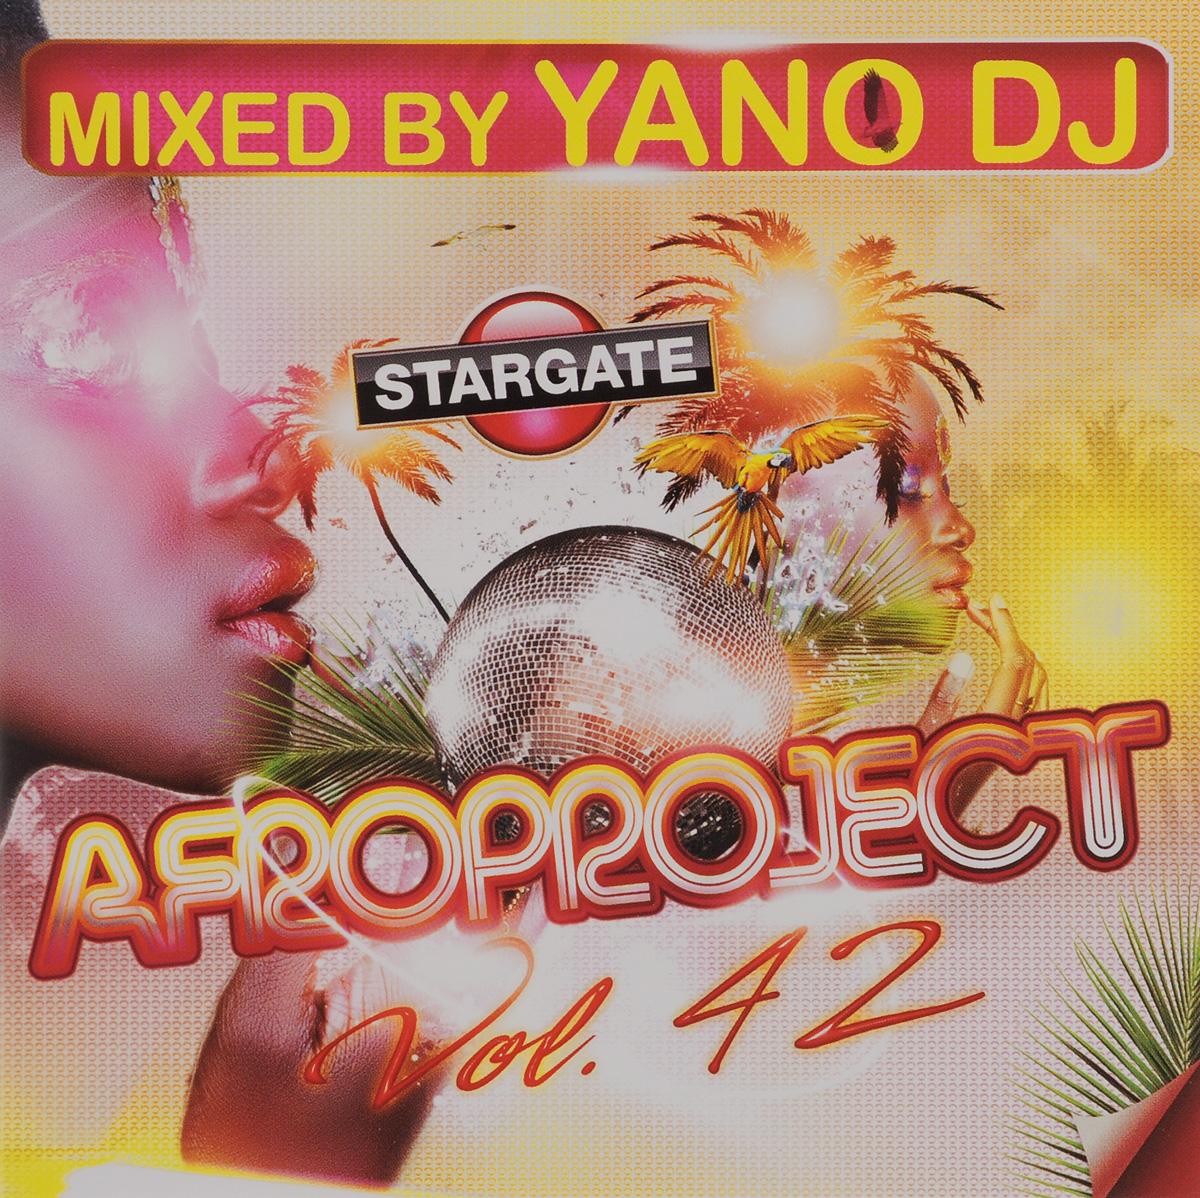 Dj Yano. Afro Project. Vol. 42 2012 Audio CD